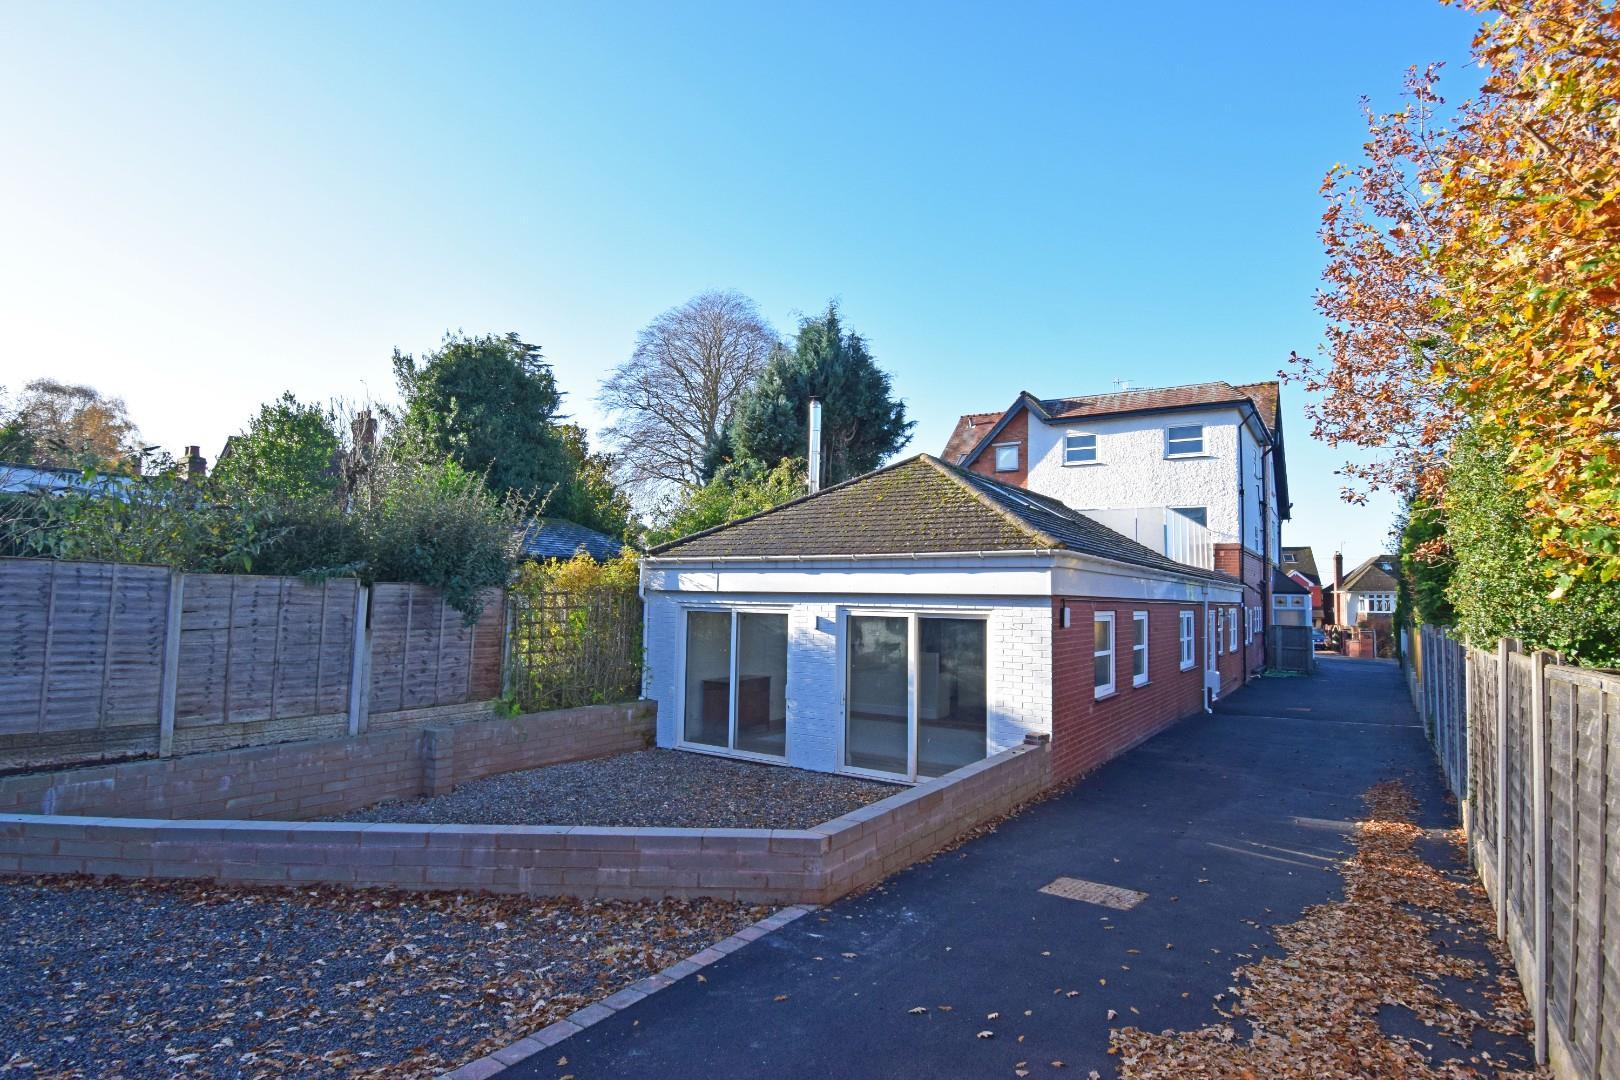 4 Chester House, Wellington Road, Aston Fields, Bromsgrove, Worcesterhire, B60 2AX